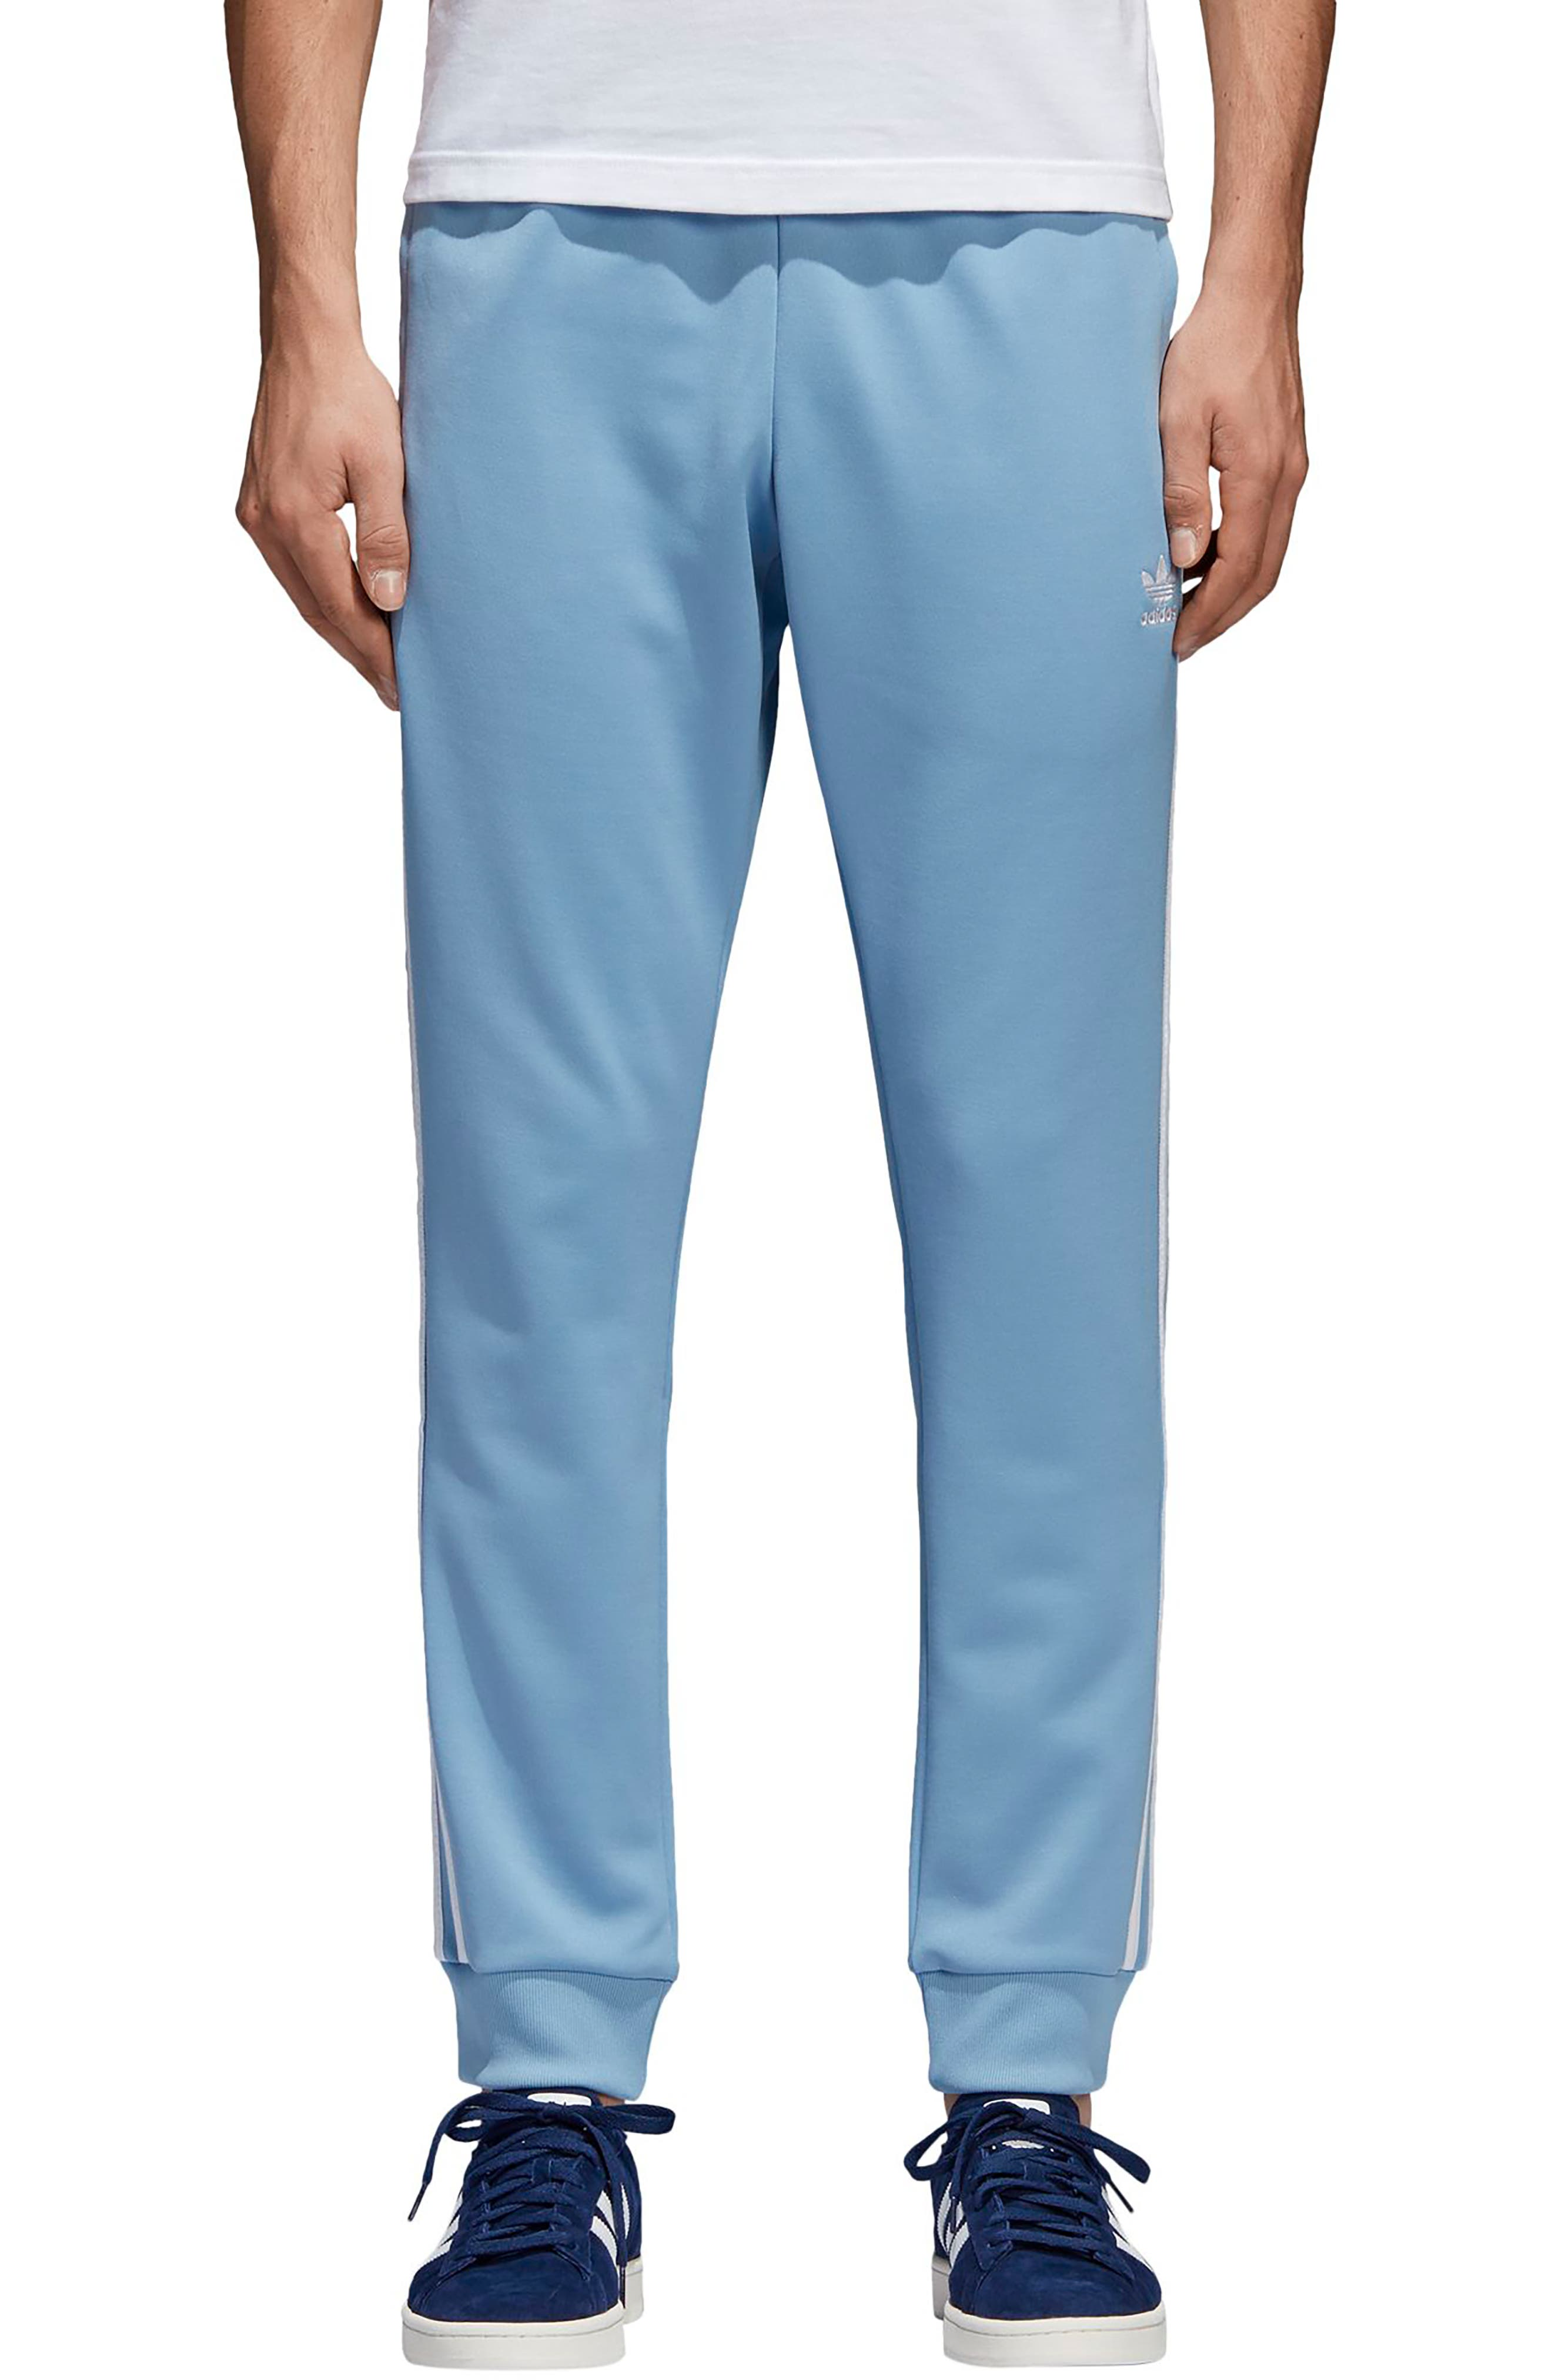 SST Track Pants,                         Main,                         color,